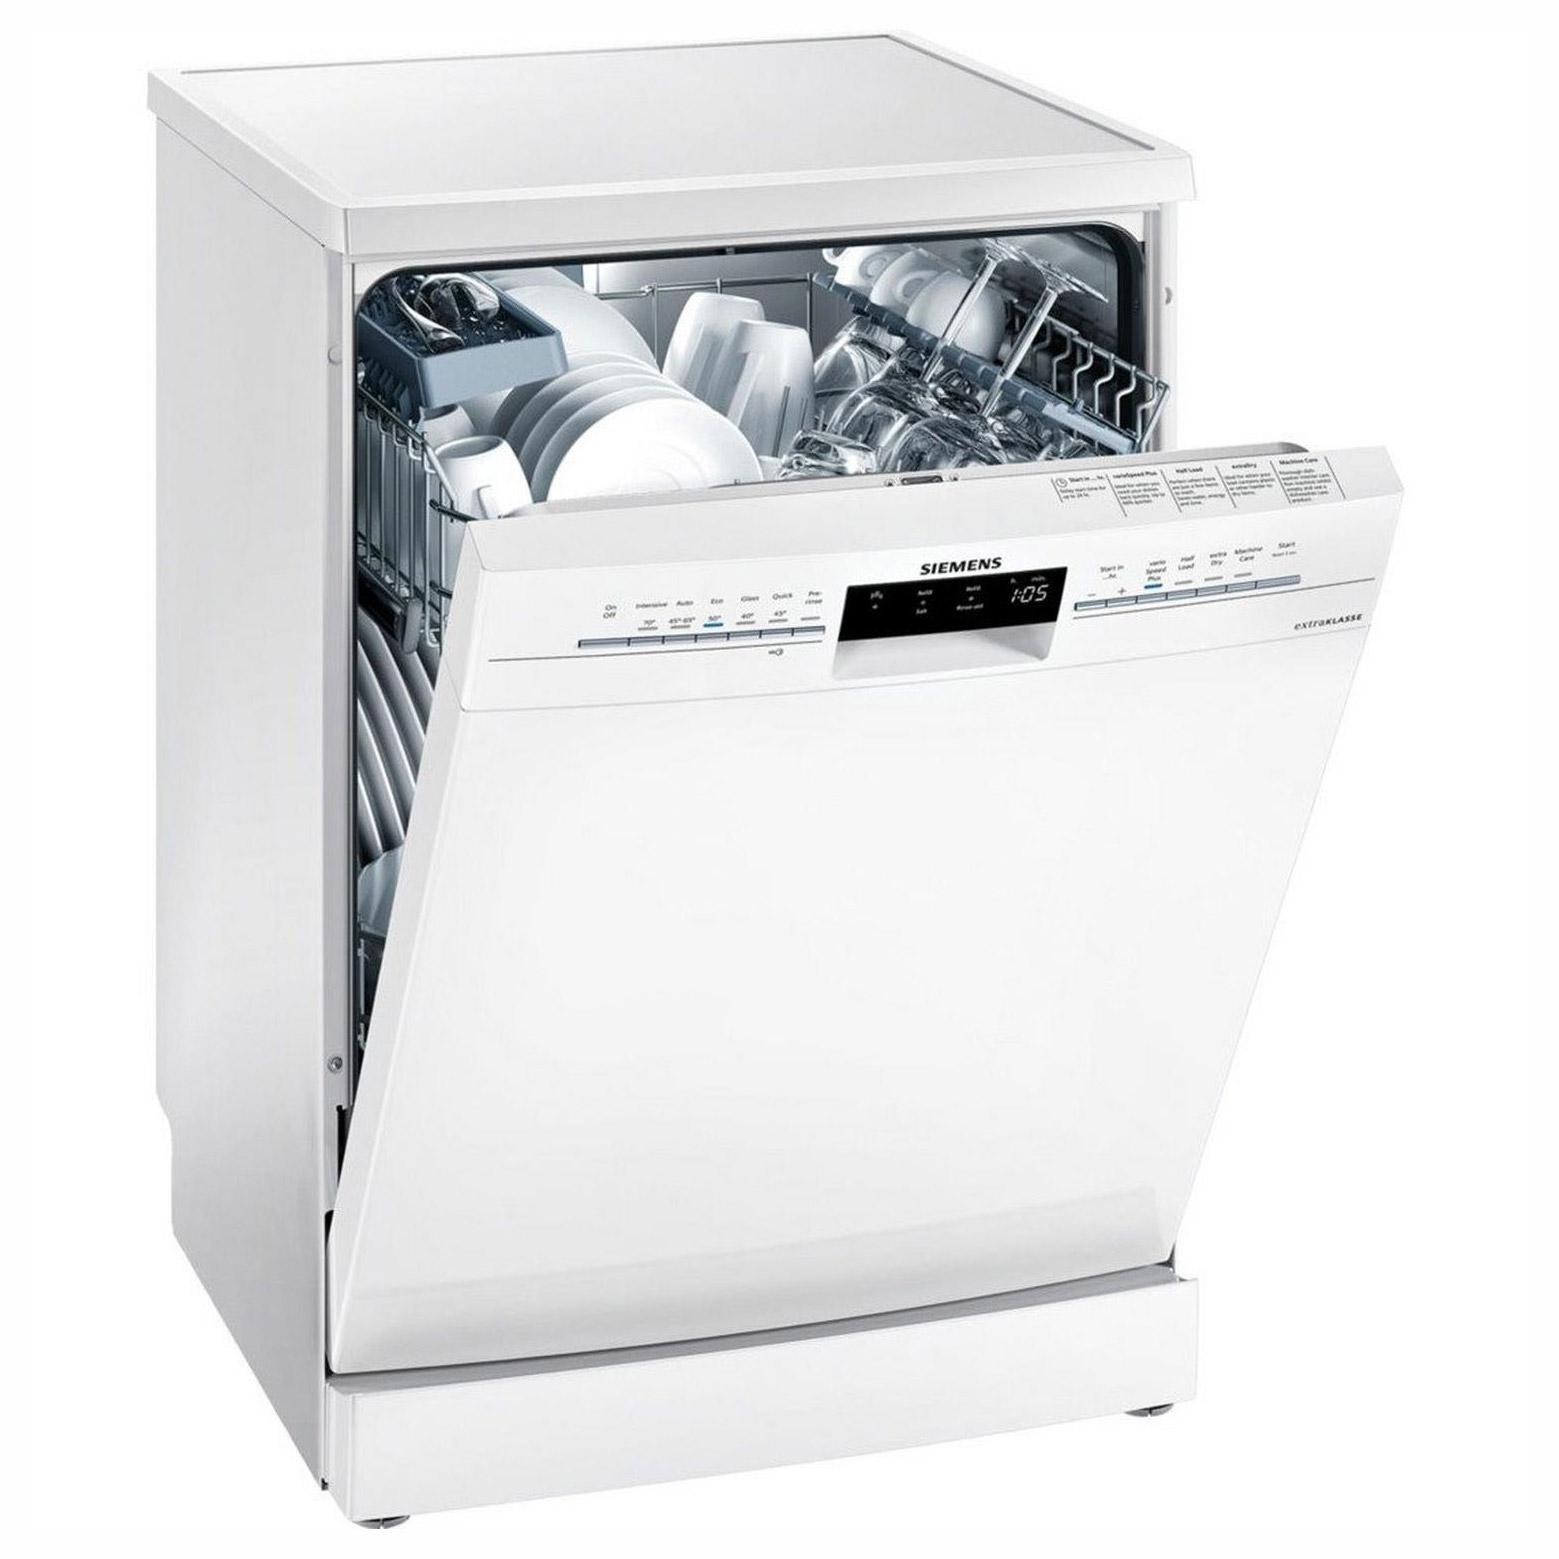 Siemens SN236W02JG 60cm iQ300 Dishwasher in White, 13 Place Settings A++